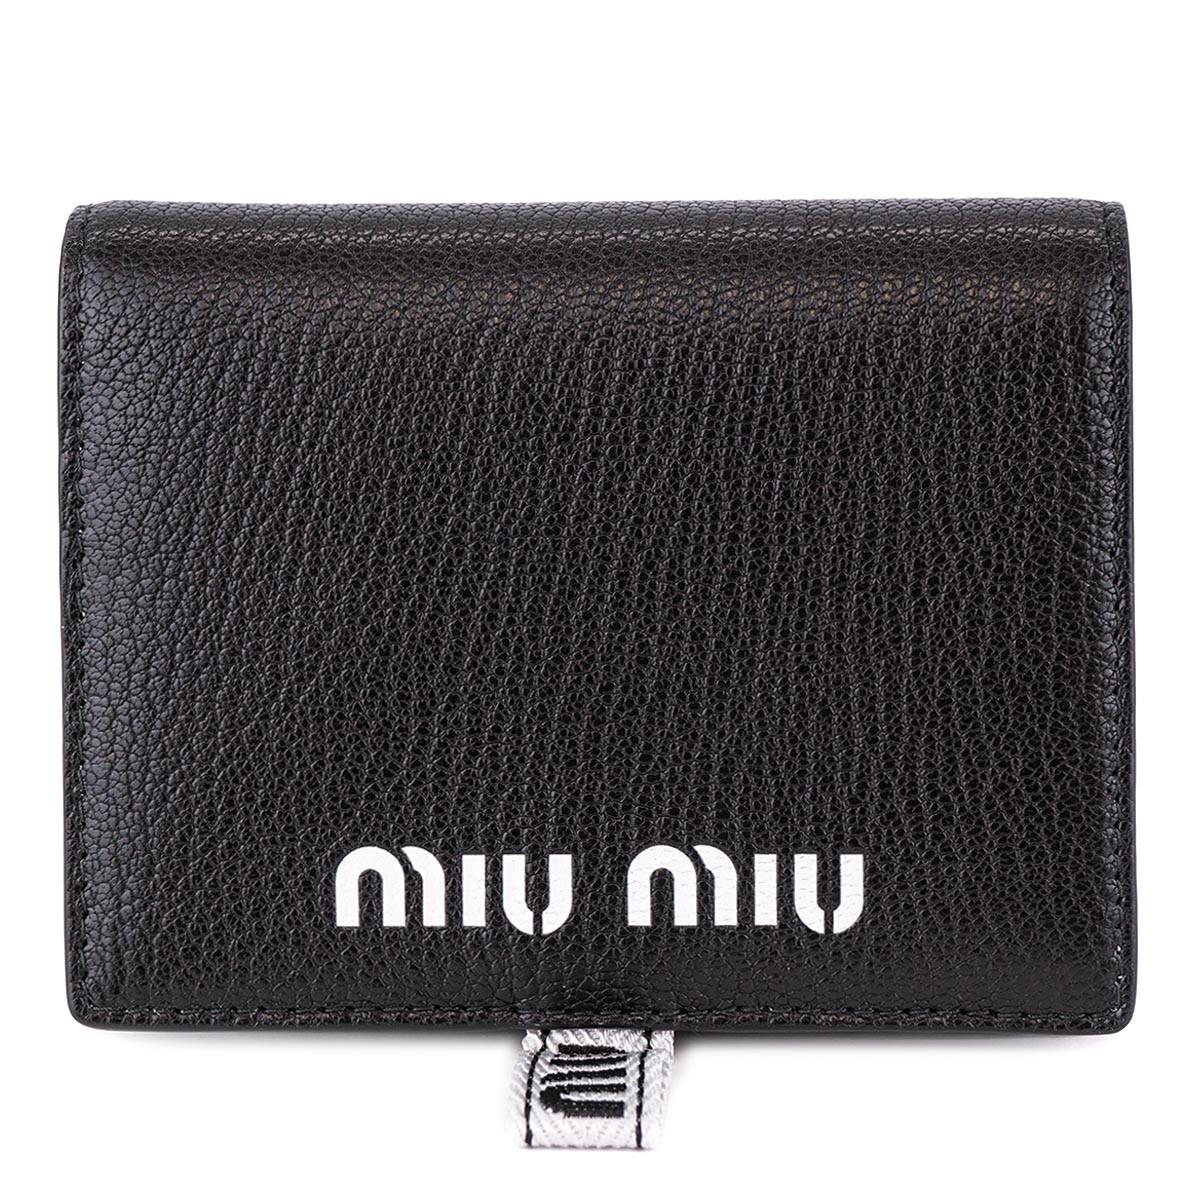 on sale cfc98 d1cde MIUMIU ミュウミュウ 二つ折り財布 BLACK 5MV2042B64 MADRAS ...